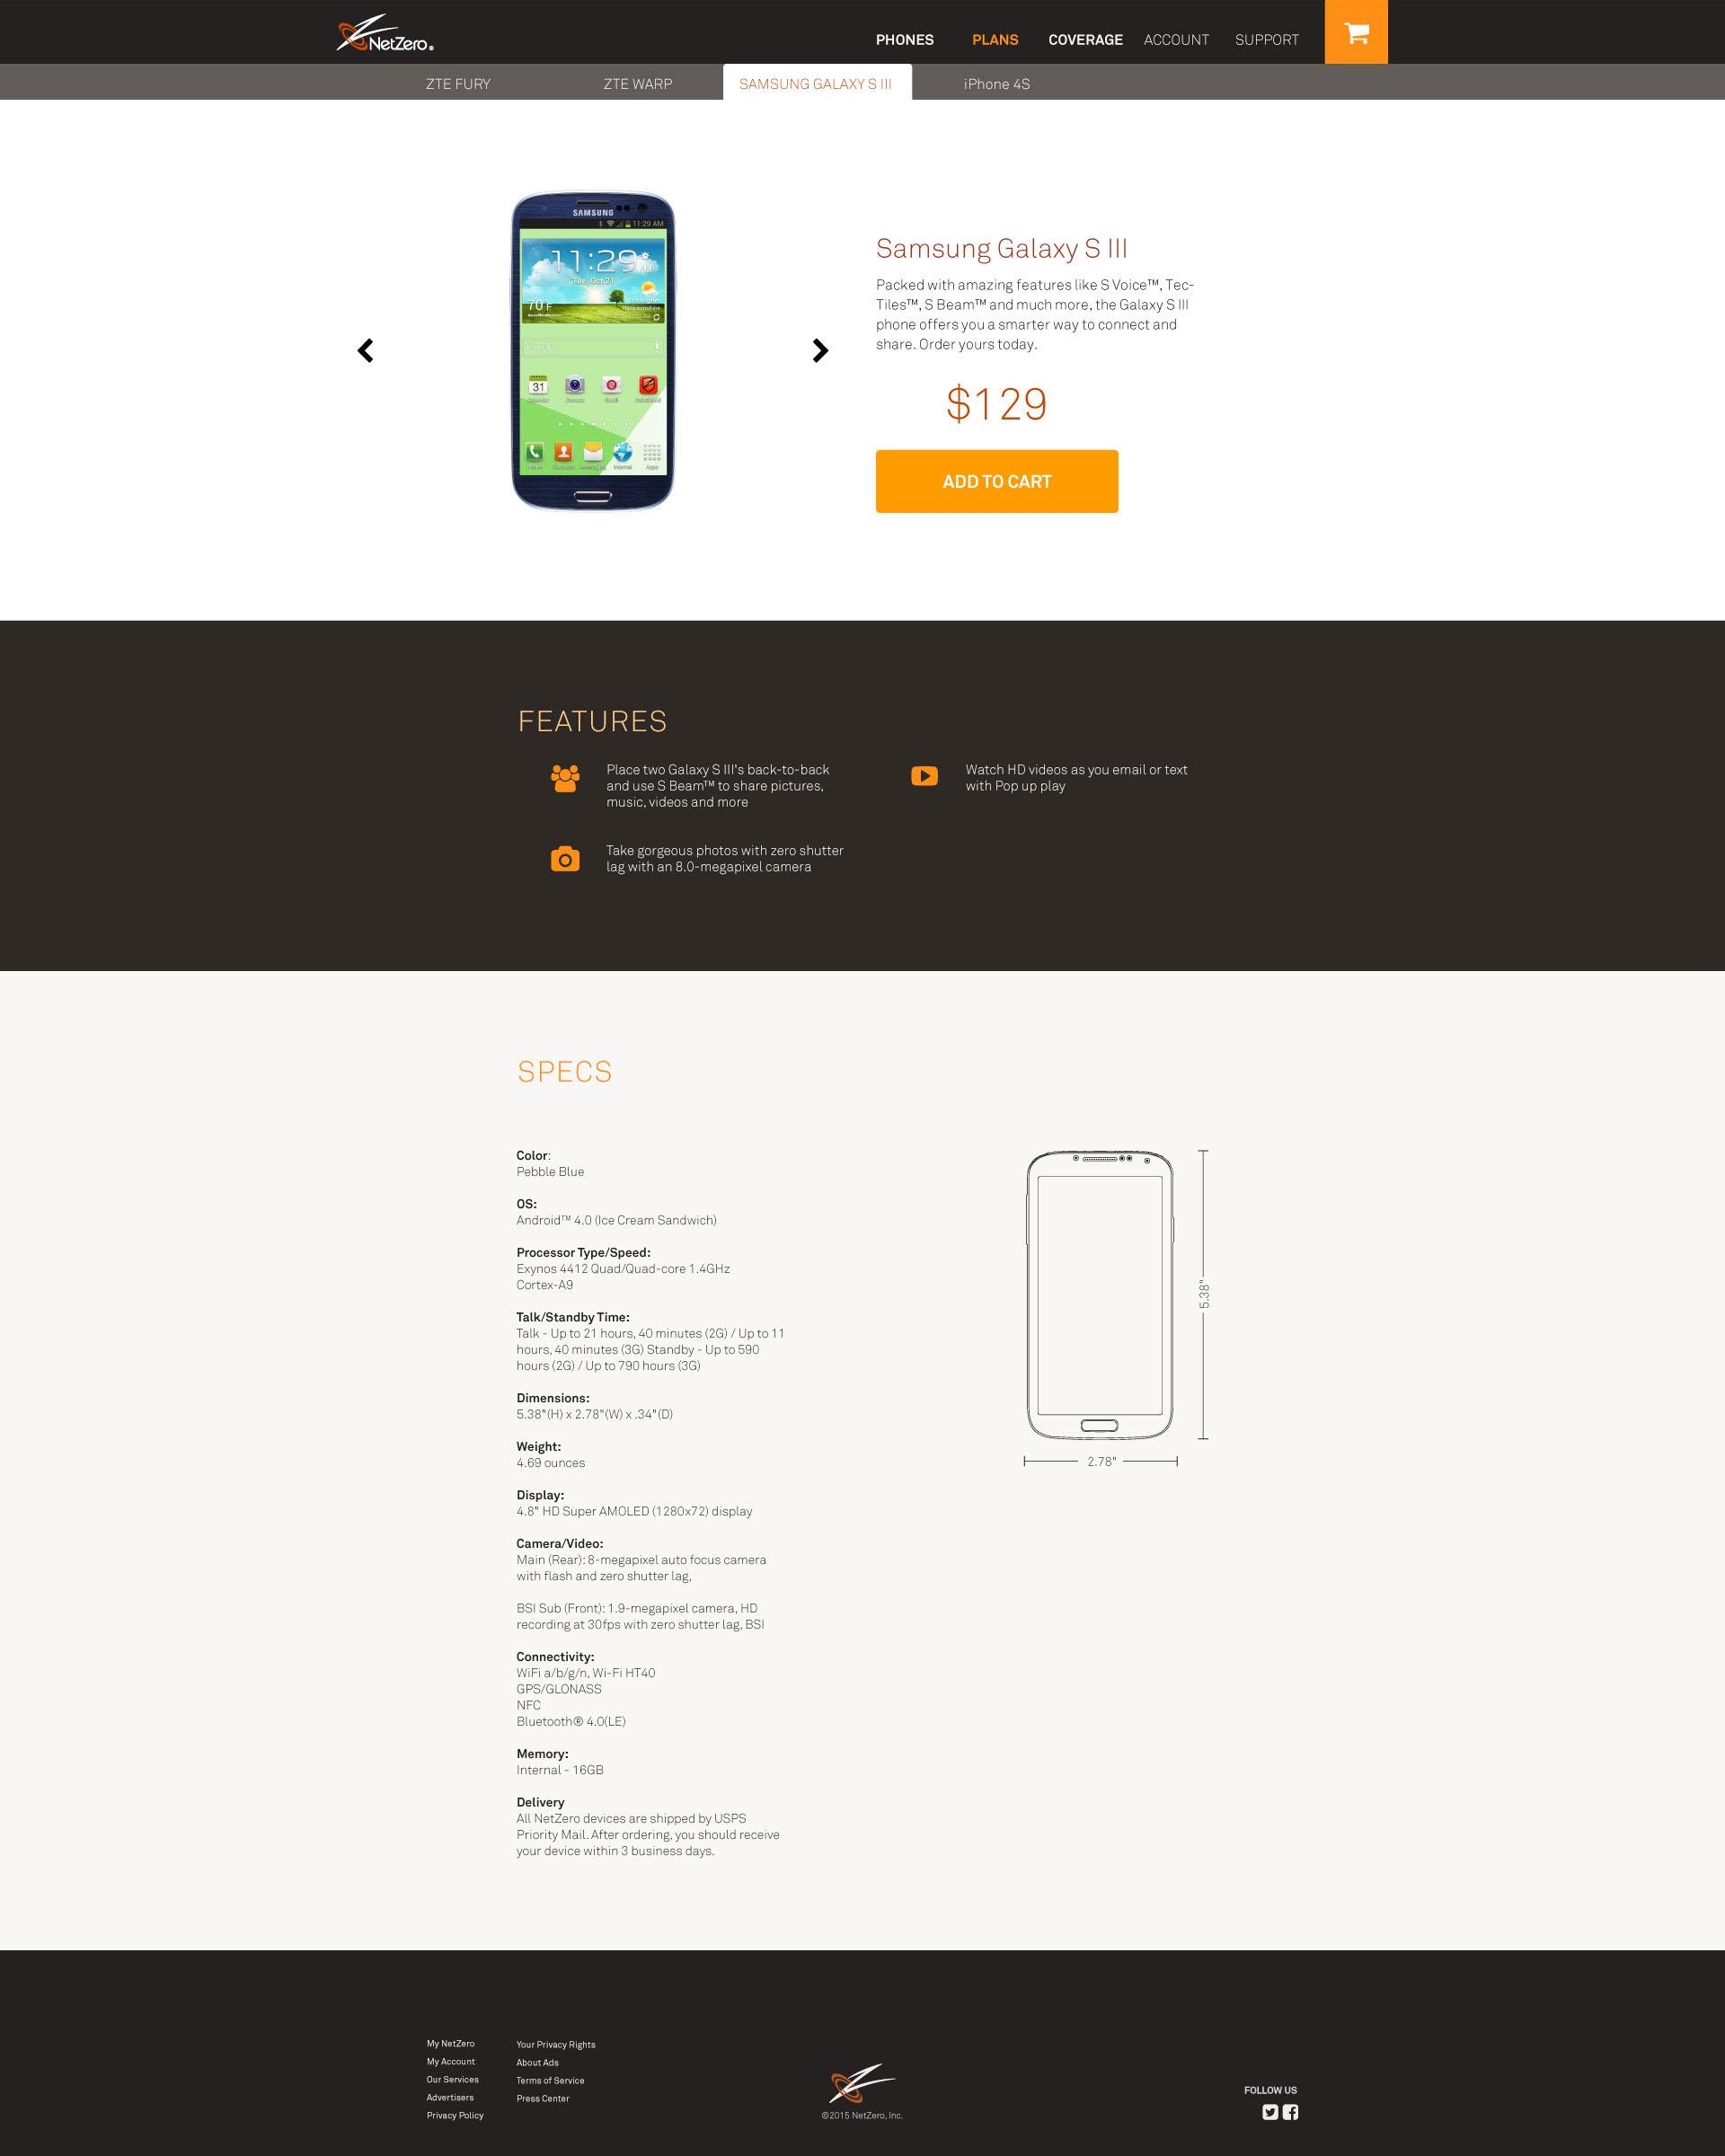 desktop NetZero product phone page with price